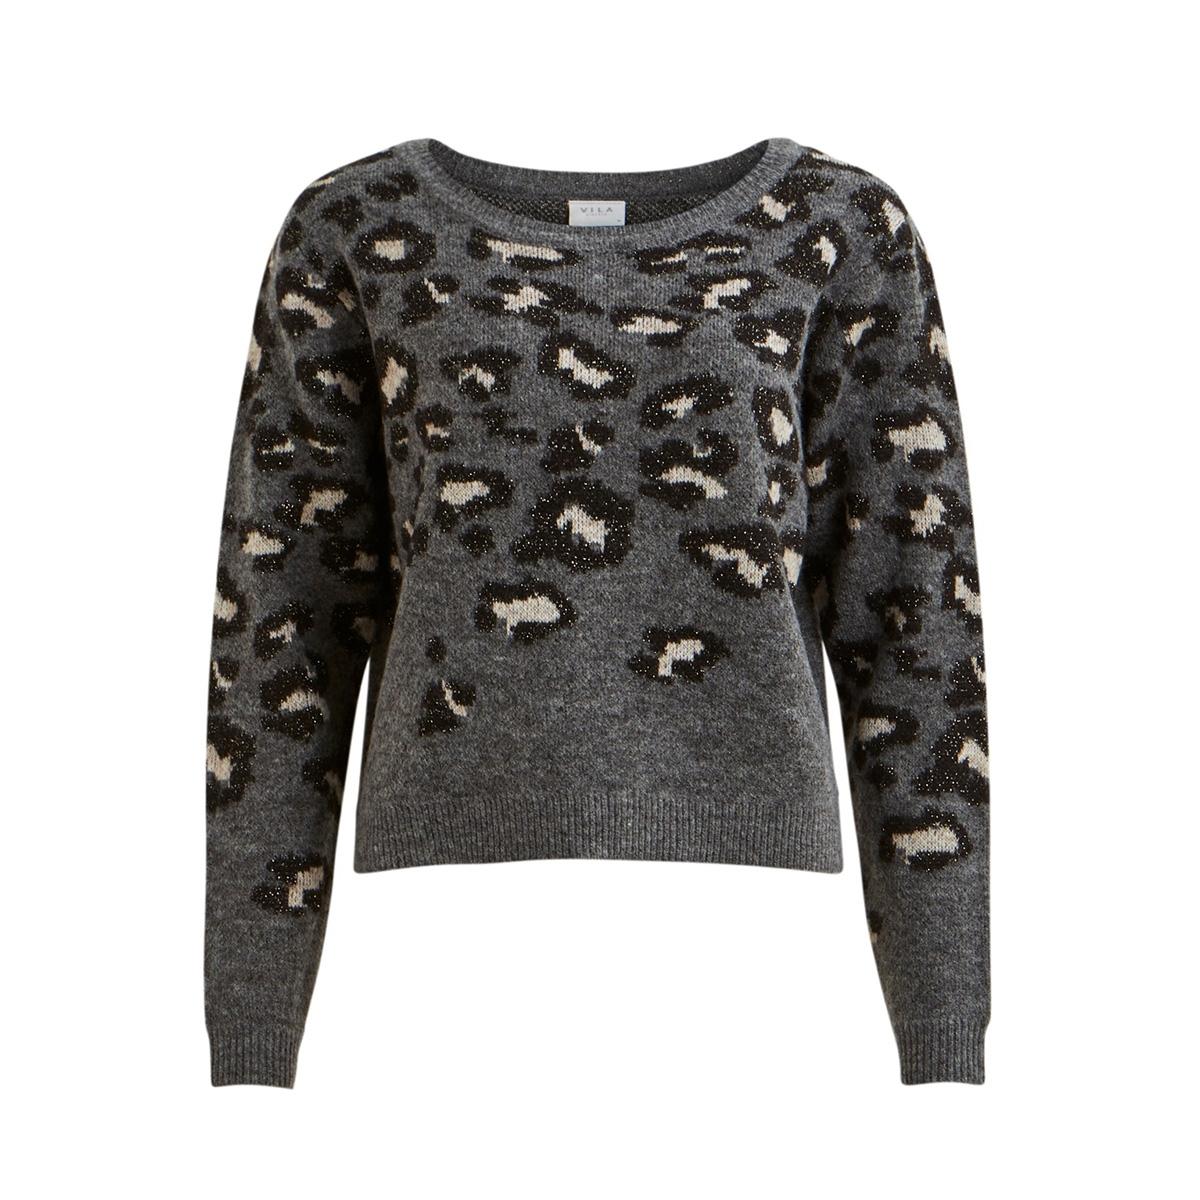 vilidi knit o-neck l/s top ki 14053193 vila trui medium grey mel/black w.l